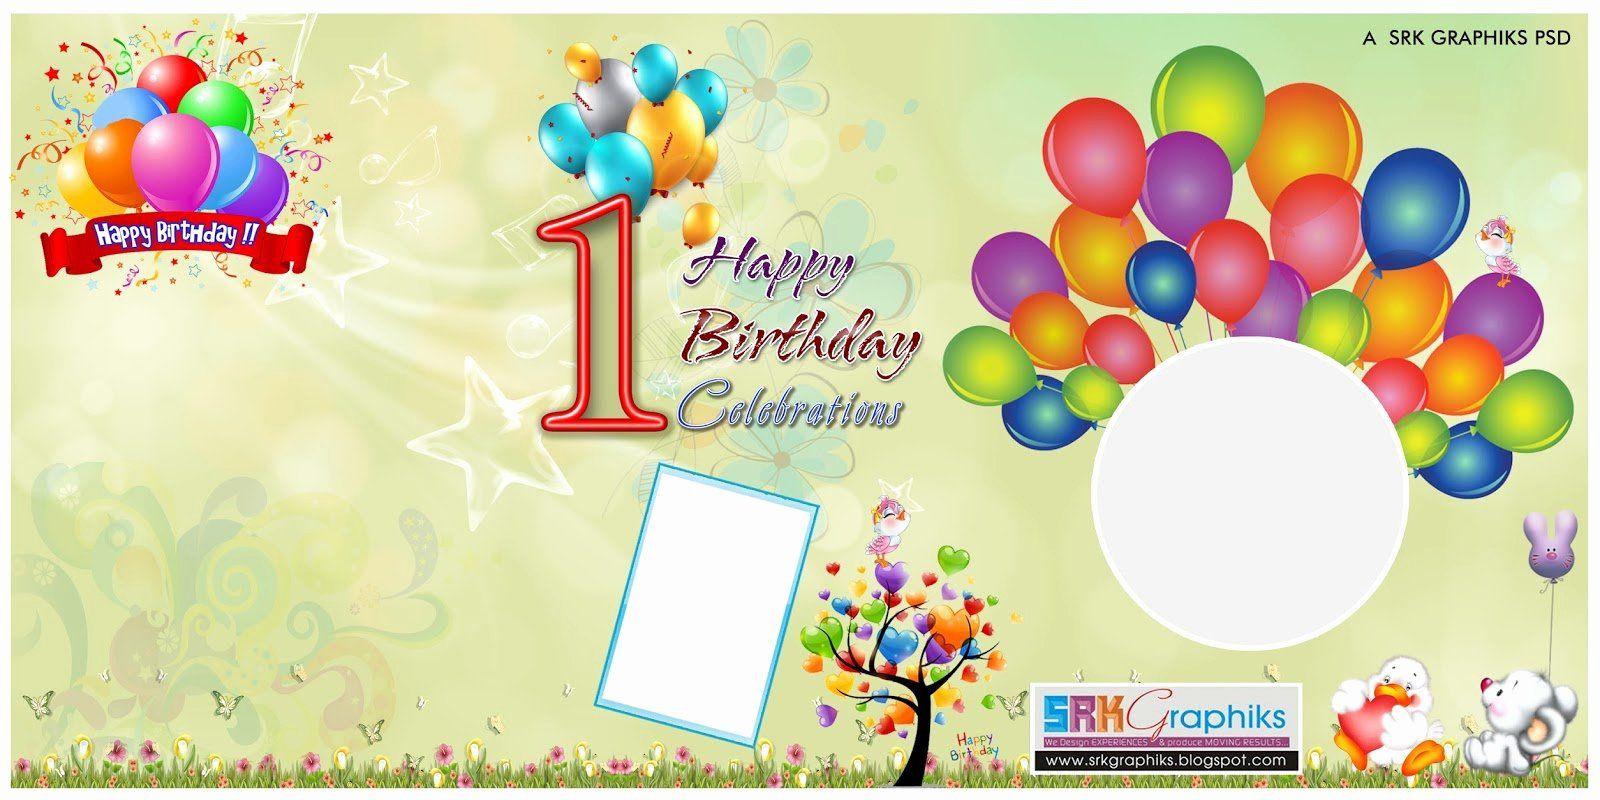 Birthday Invitation Template Photoshop Inspirational Birthday Invitation Templates In 2020 Birthday Card Template Free Free Birthday Banner Birthday Background Design